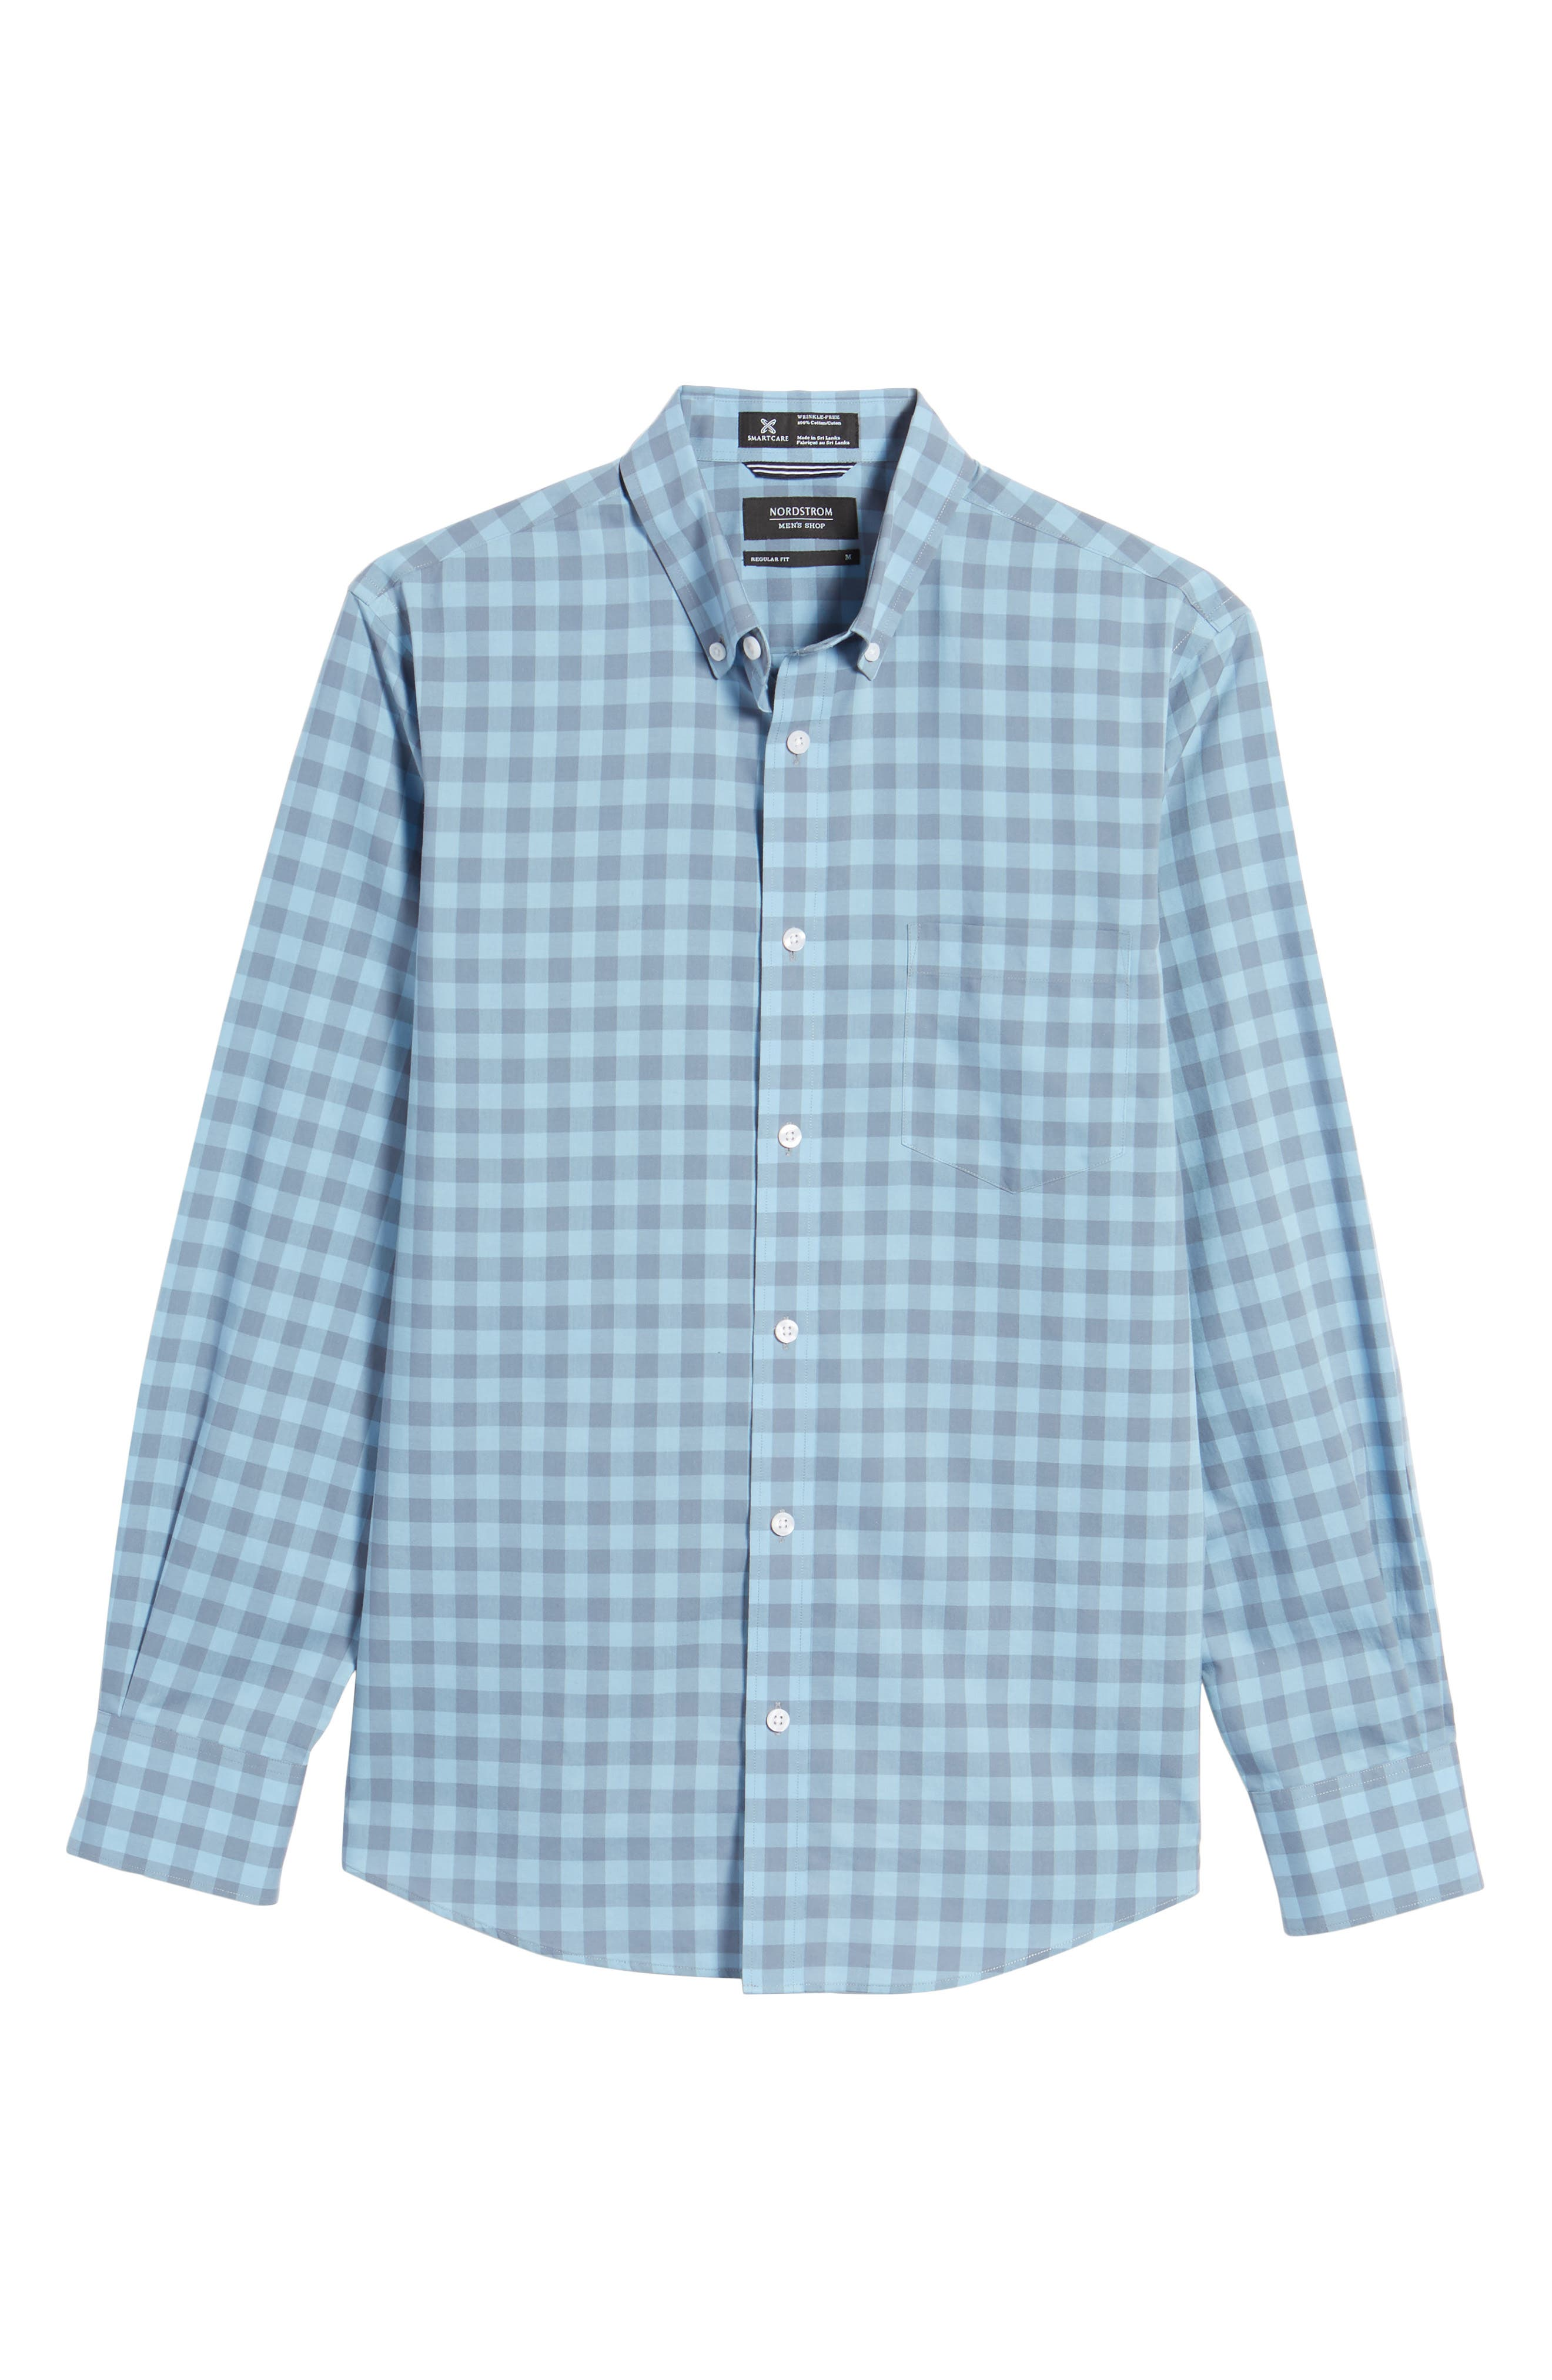 Regular Fit Gingham Sport Shirt,                             Alternate thumbnail 6, color,                             Blue Dusk Grey Gingham